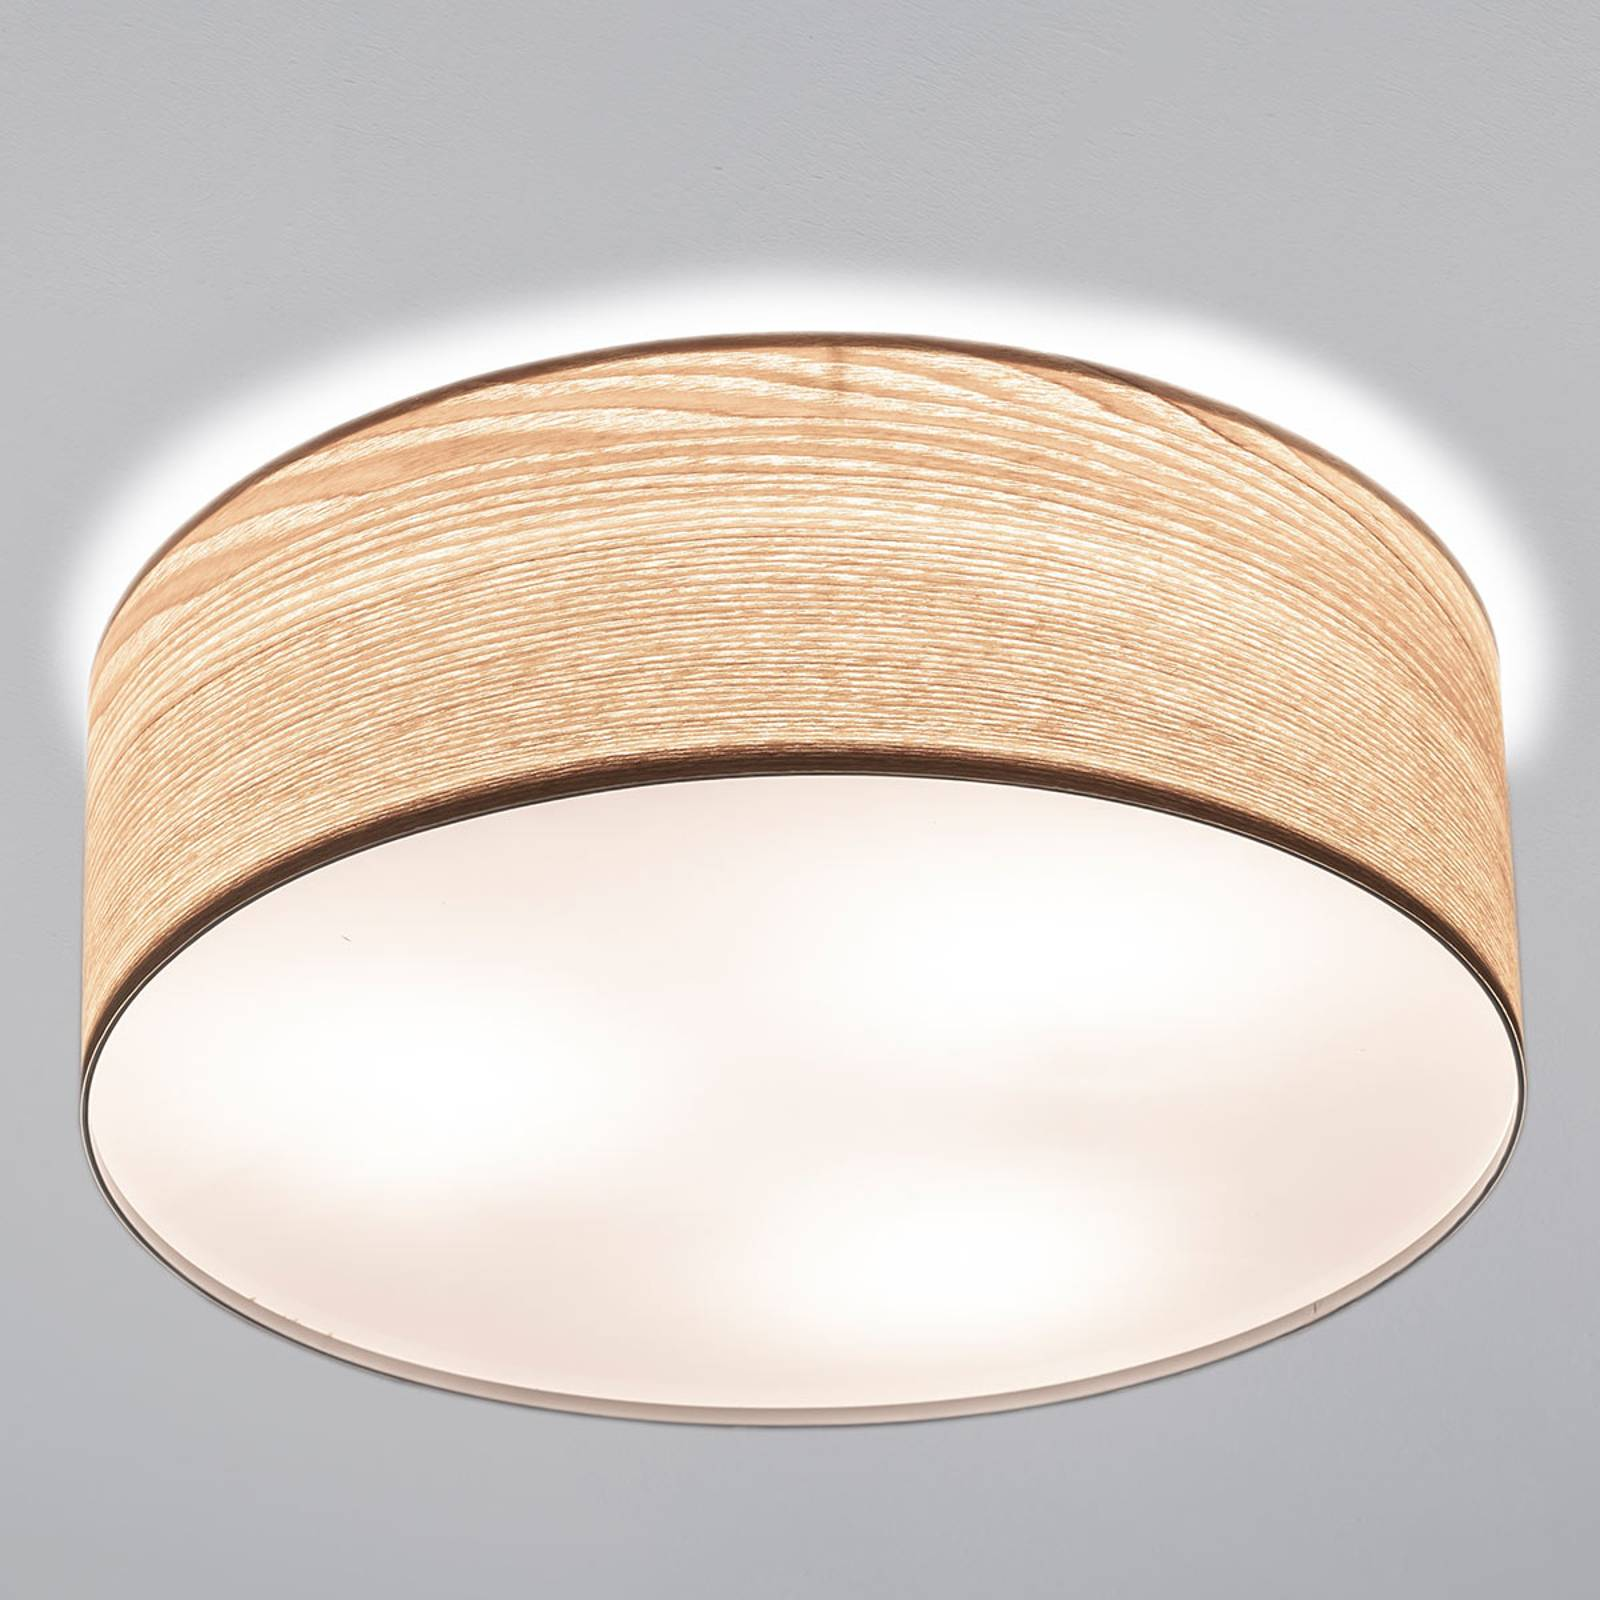 Chique plafondlamp Liska in licht houten design